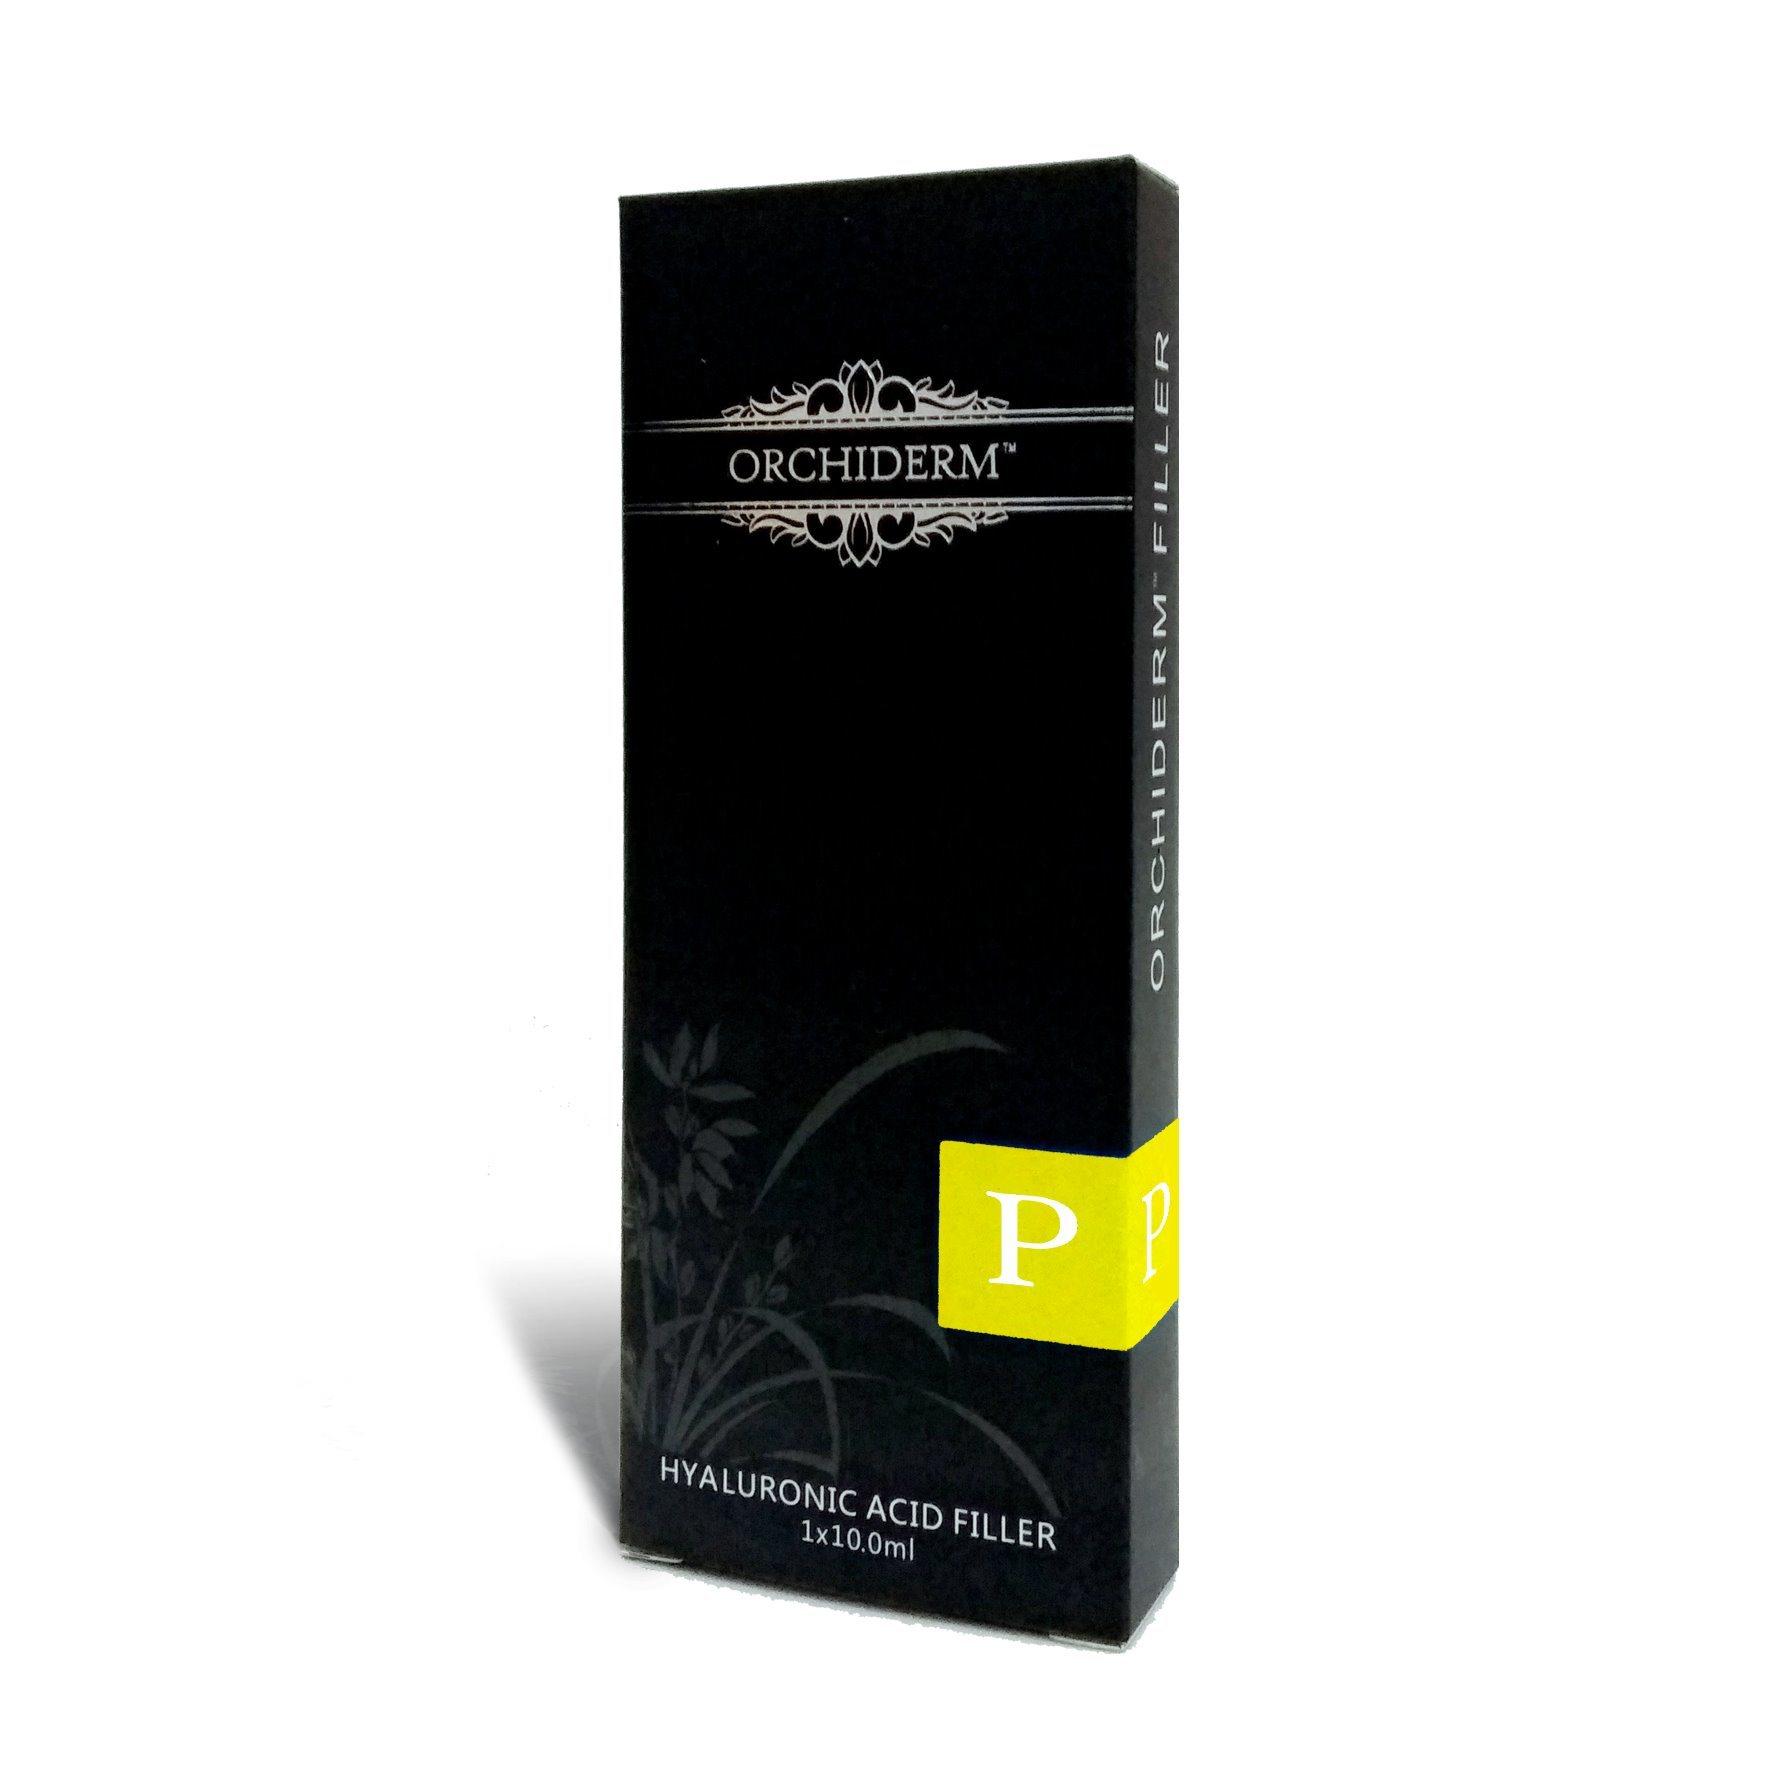 Orchiderm Ha Dermal Filler for Lip Contouring/ Lip Augmentation